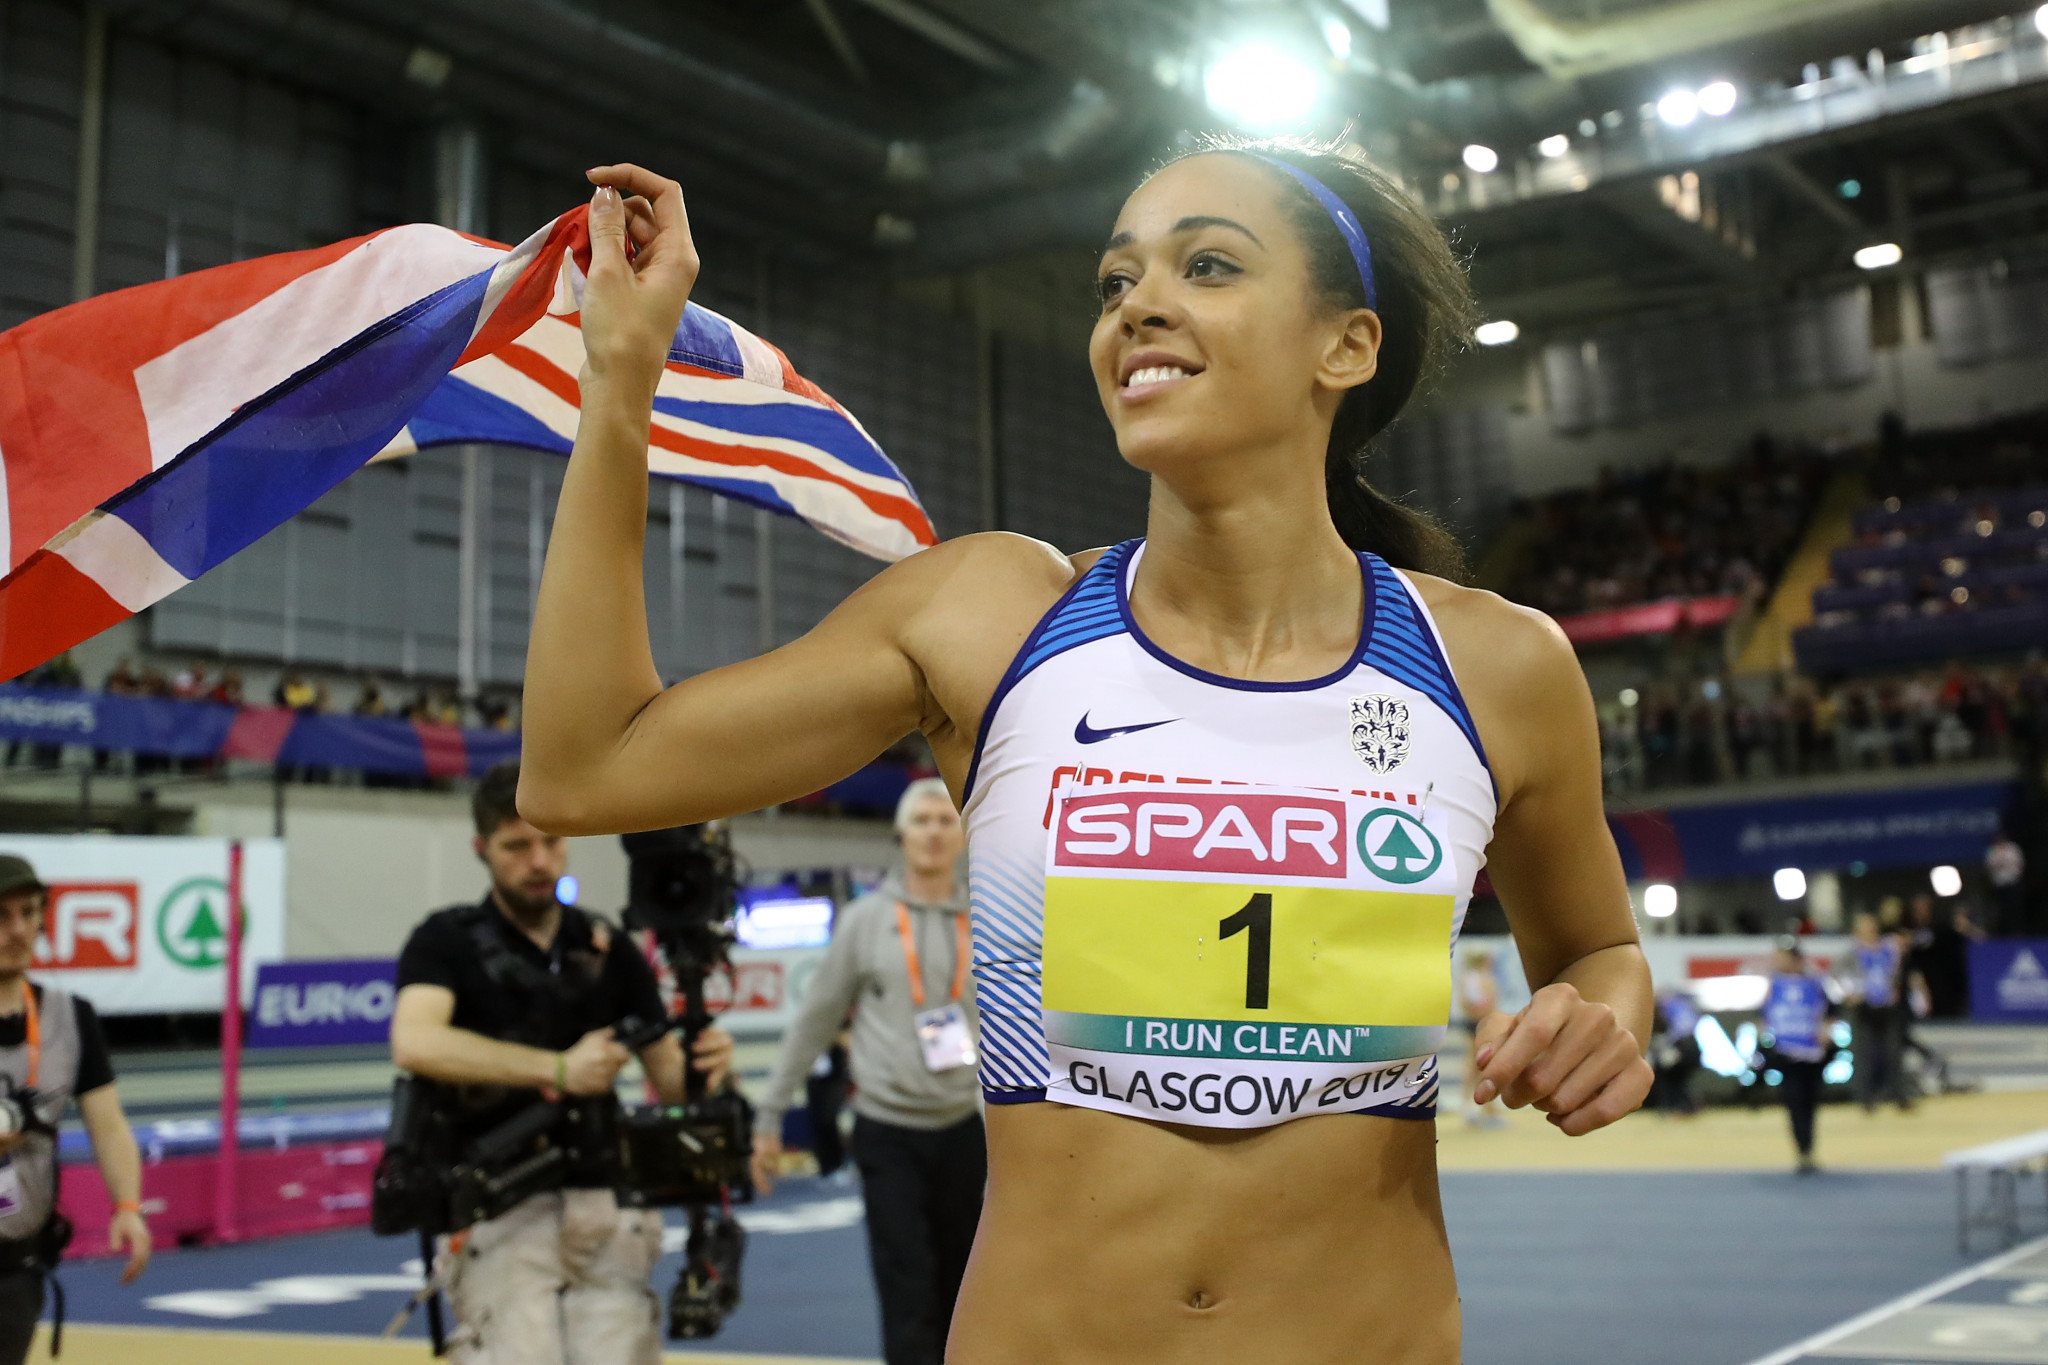 Britain's Katarina Johnson-Thompson set a world lead in the heptathlon event ©Getty Images